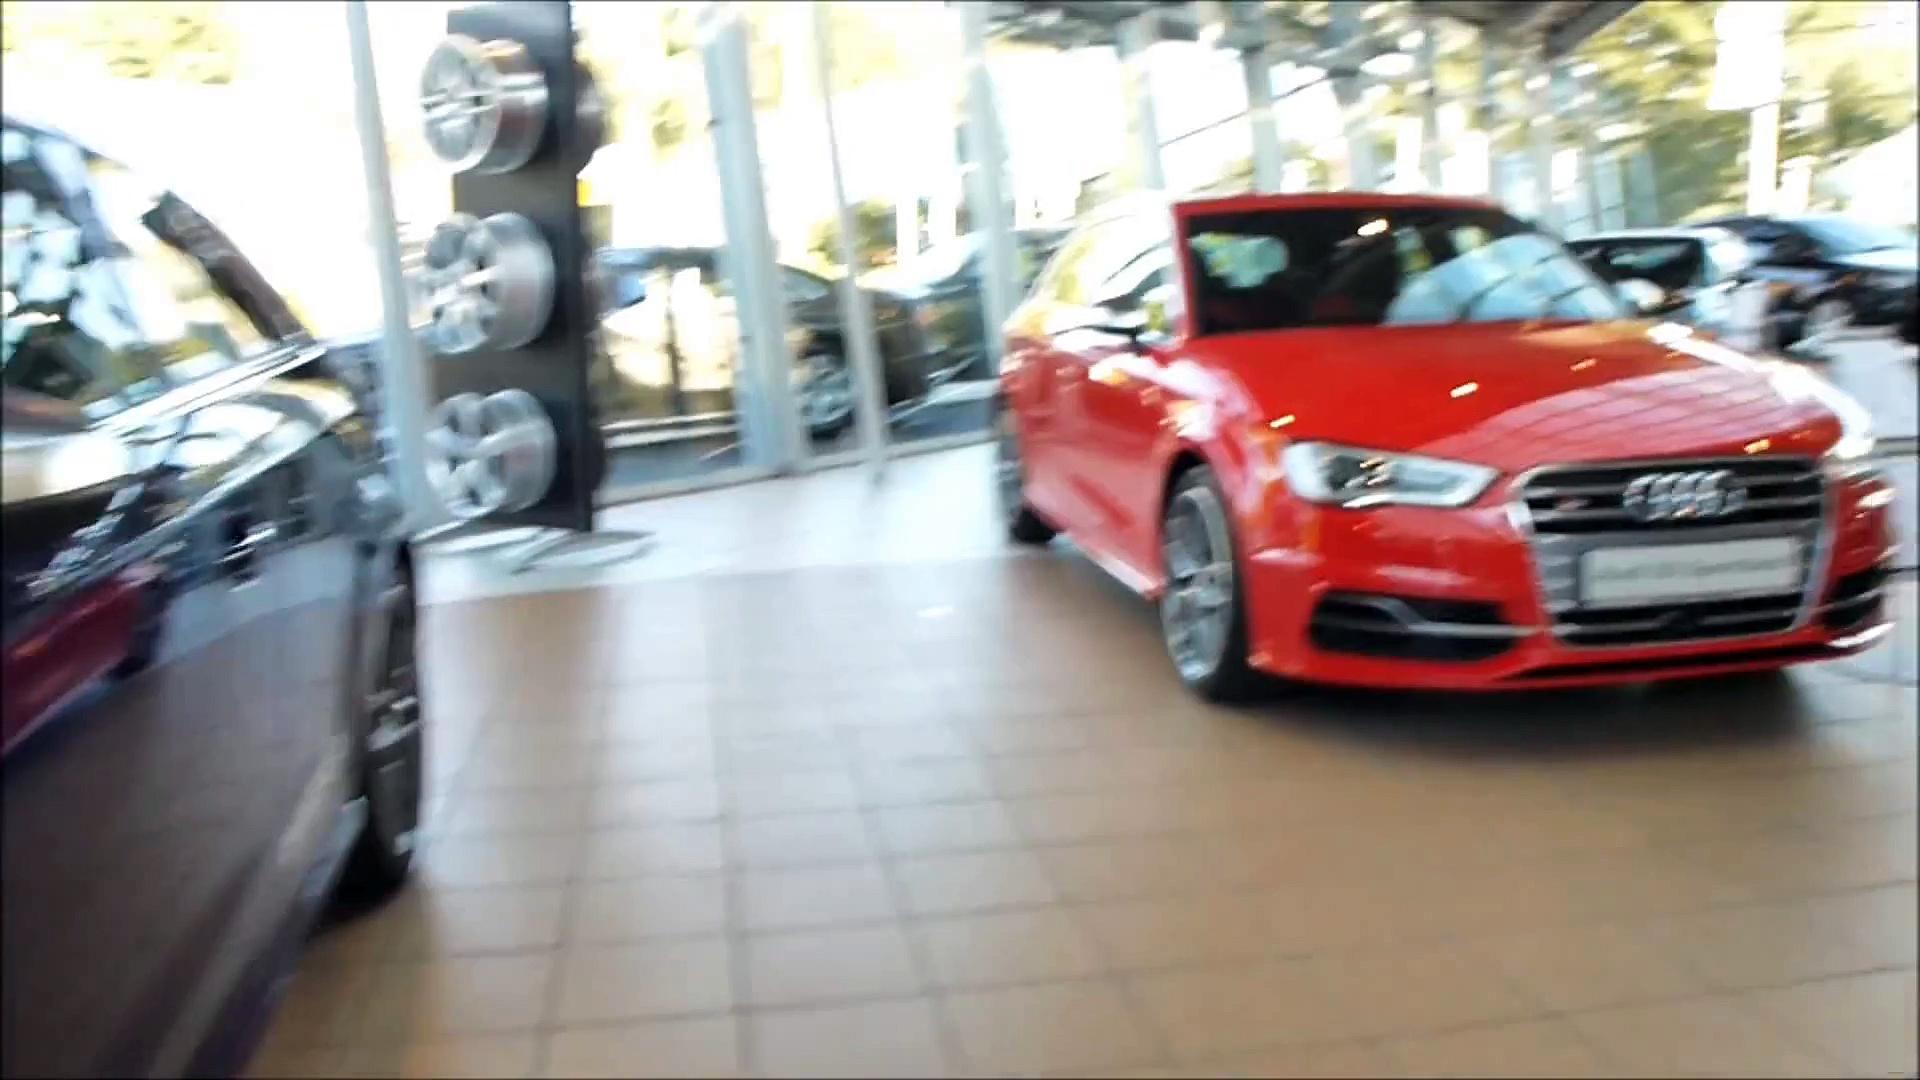 2014 Audi R8 Spyder -Audi S3 -Audi S3 Sportback -Audi RS5 Cabrio -Audi RS7 -Audi RS4 Avant (2)